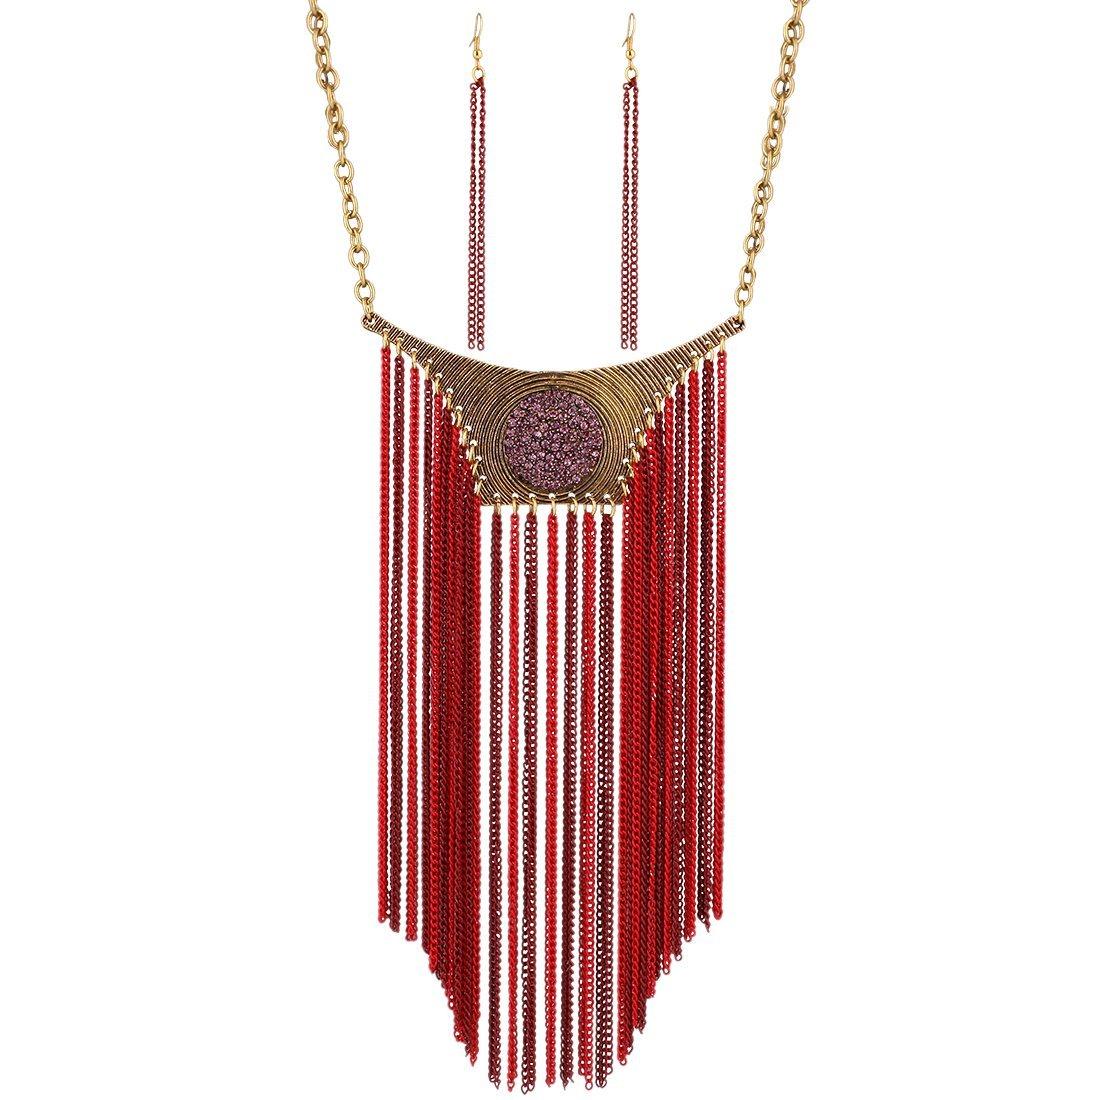 Qiyun Funky Long Tassel Chain Bling Rhinestone Tribal Necklace Earrings Set Long Gland Tribale Collier W005N2014